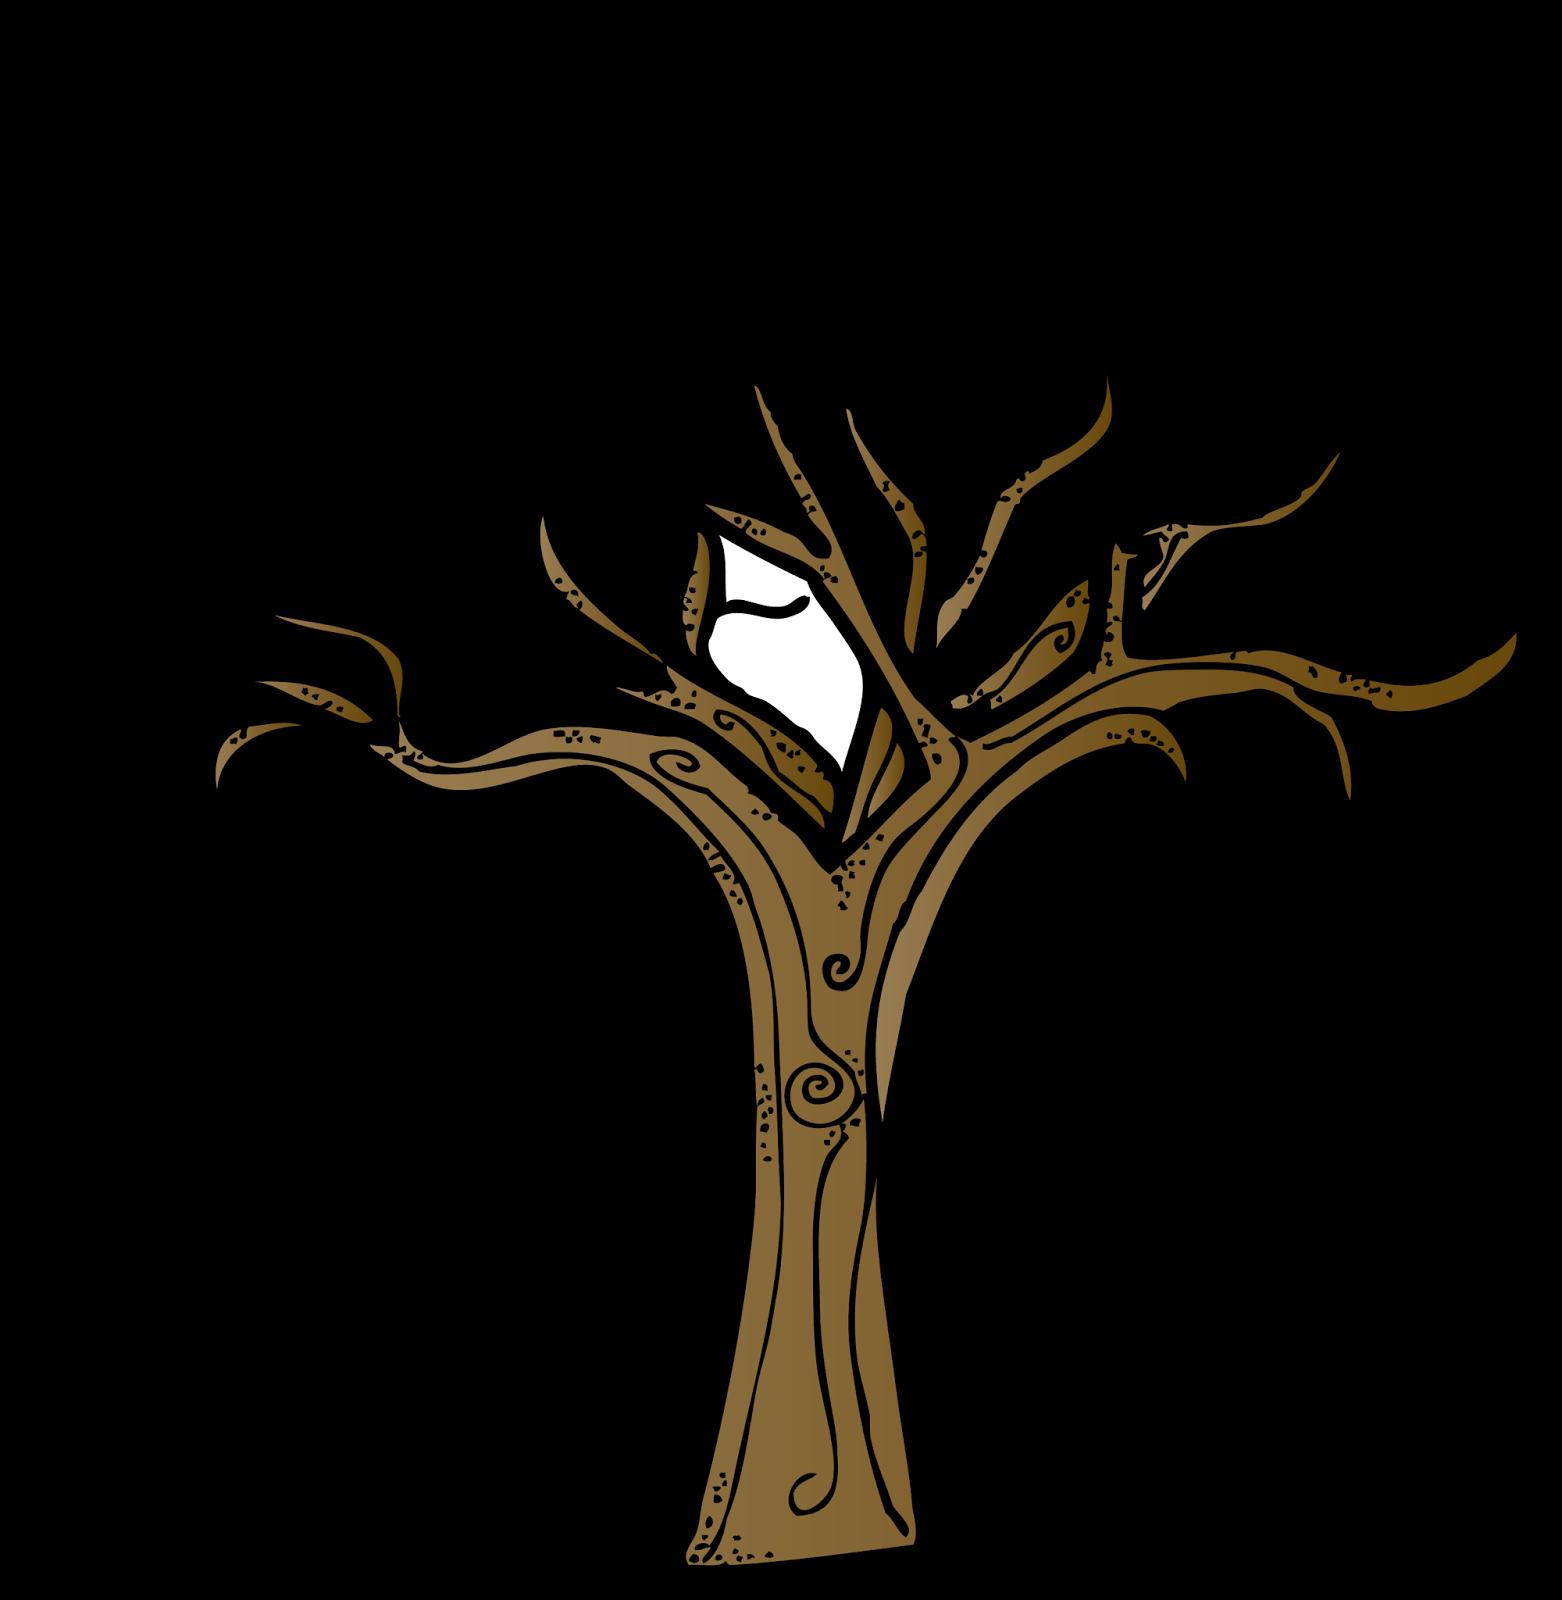 Dead Tree Trunk Clip Art-Dead Tree Trunk Clip Art-5